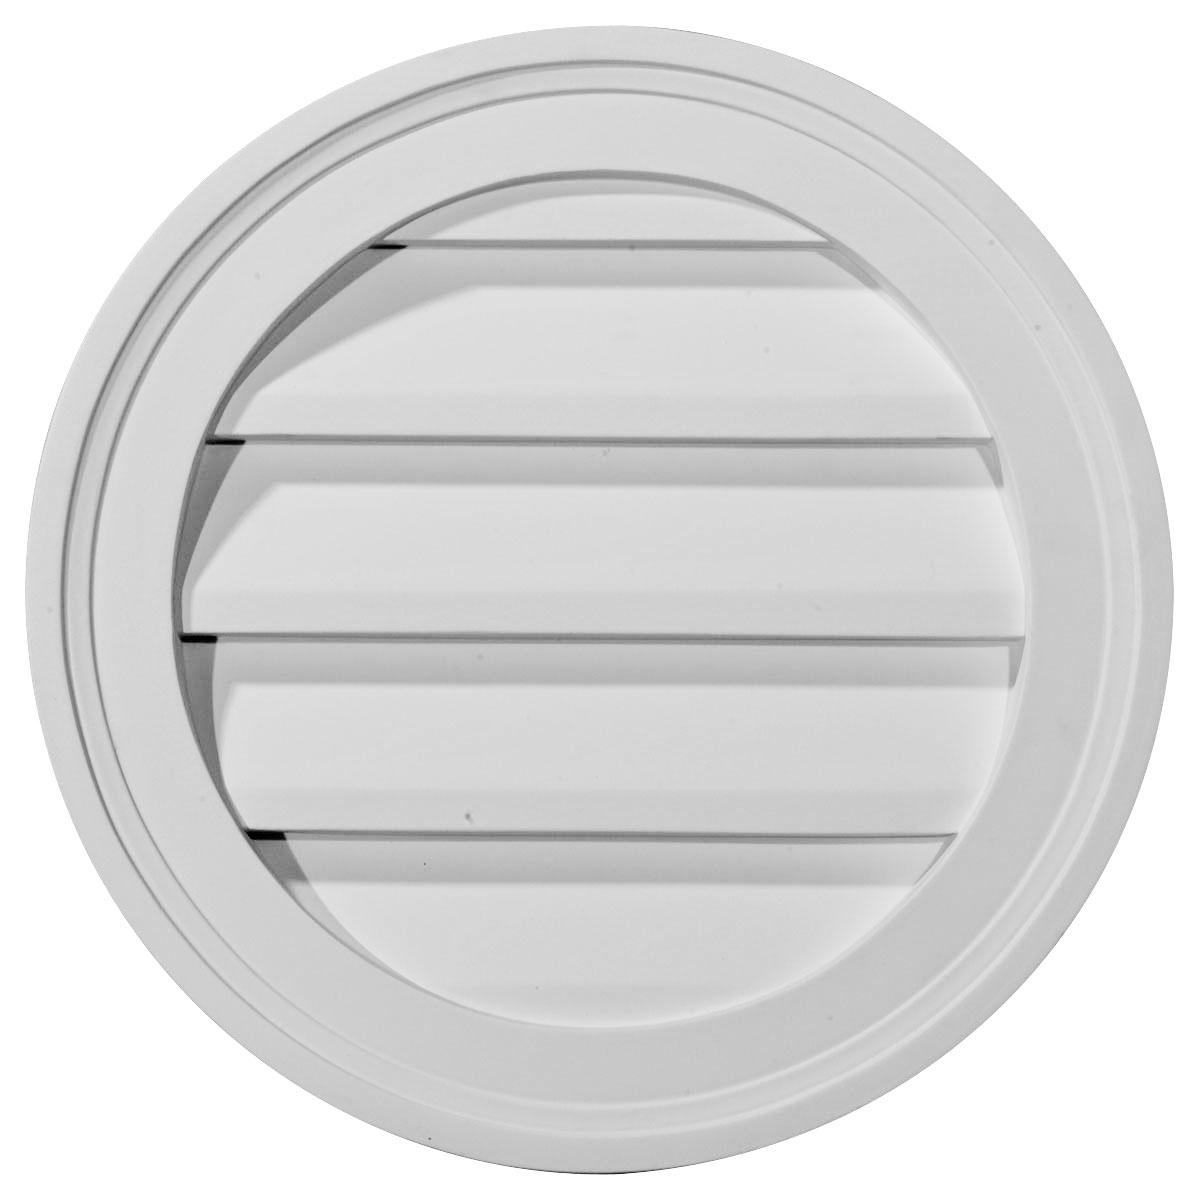 25% off gvro12d | ekena millwork | round gable vent louver,decorative